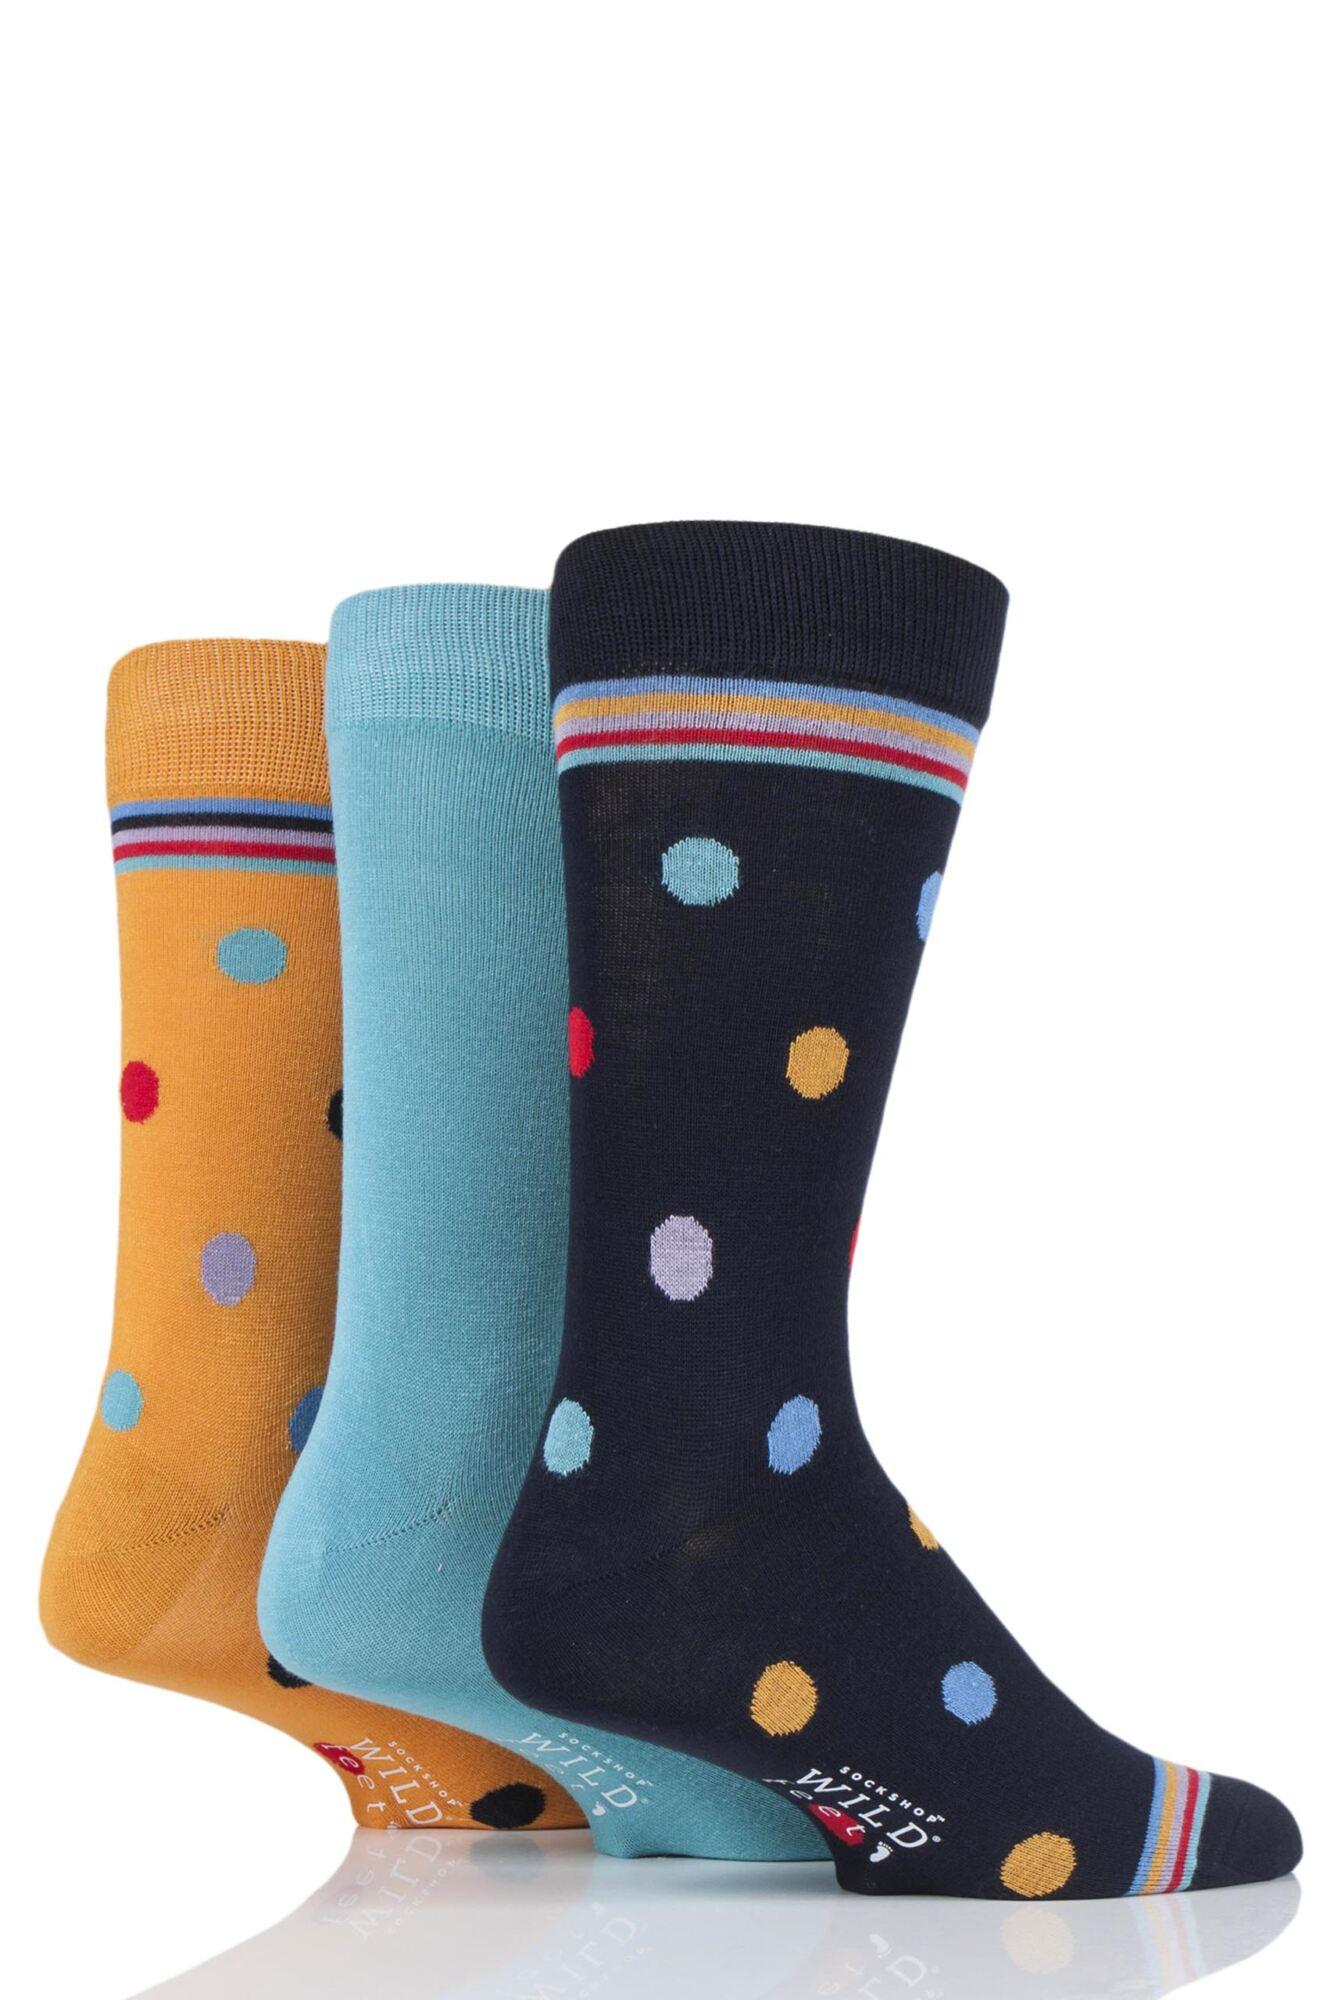 3 Pair Bamboo Spots Socks Men's - Wild Feet